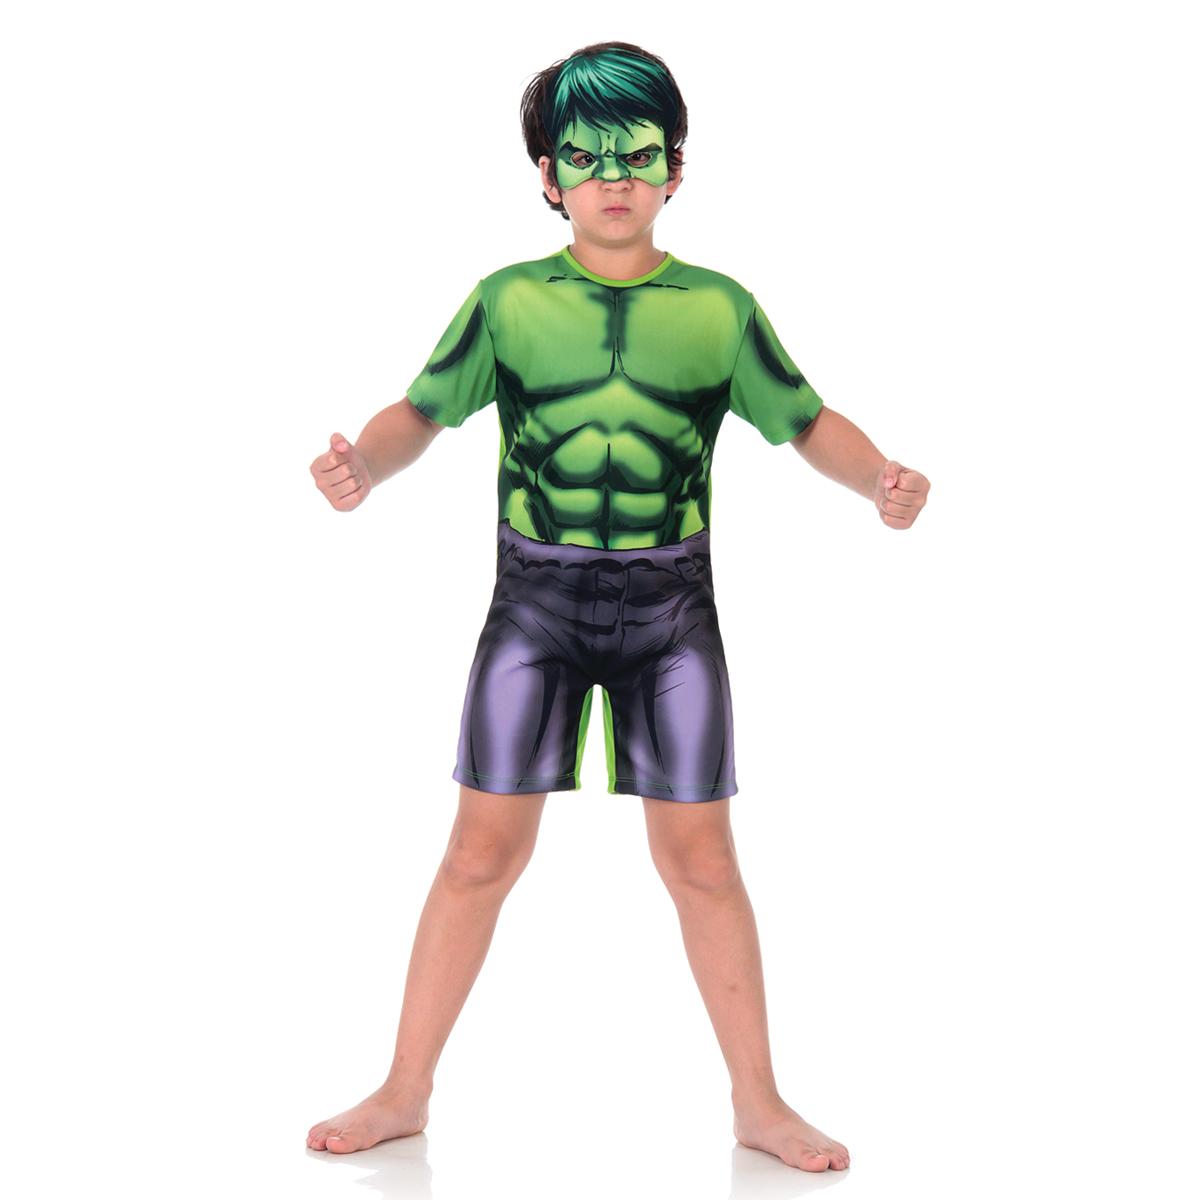 Fantasia Hulk Infantil Curto - Cosplay Marvel Original - Abrakadabra